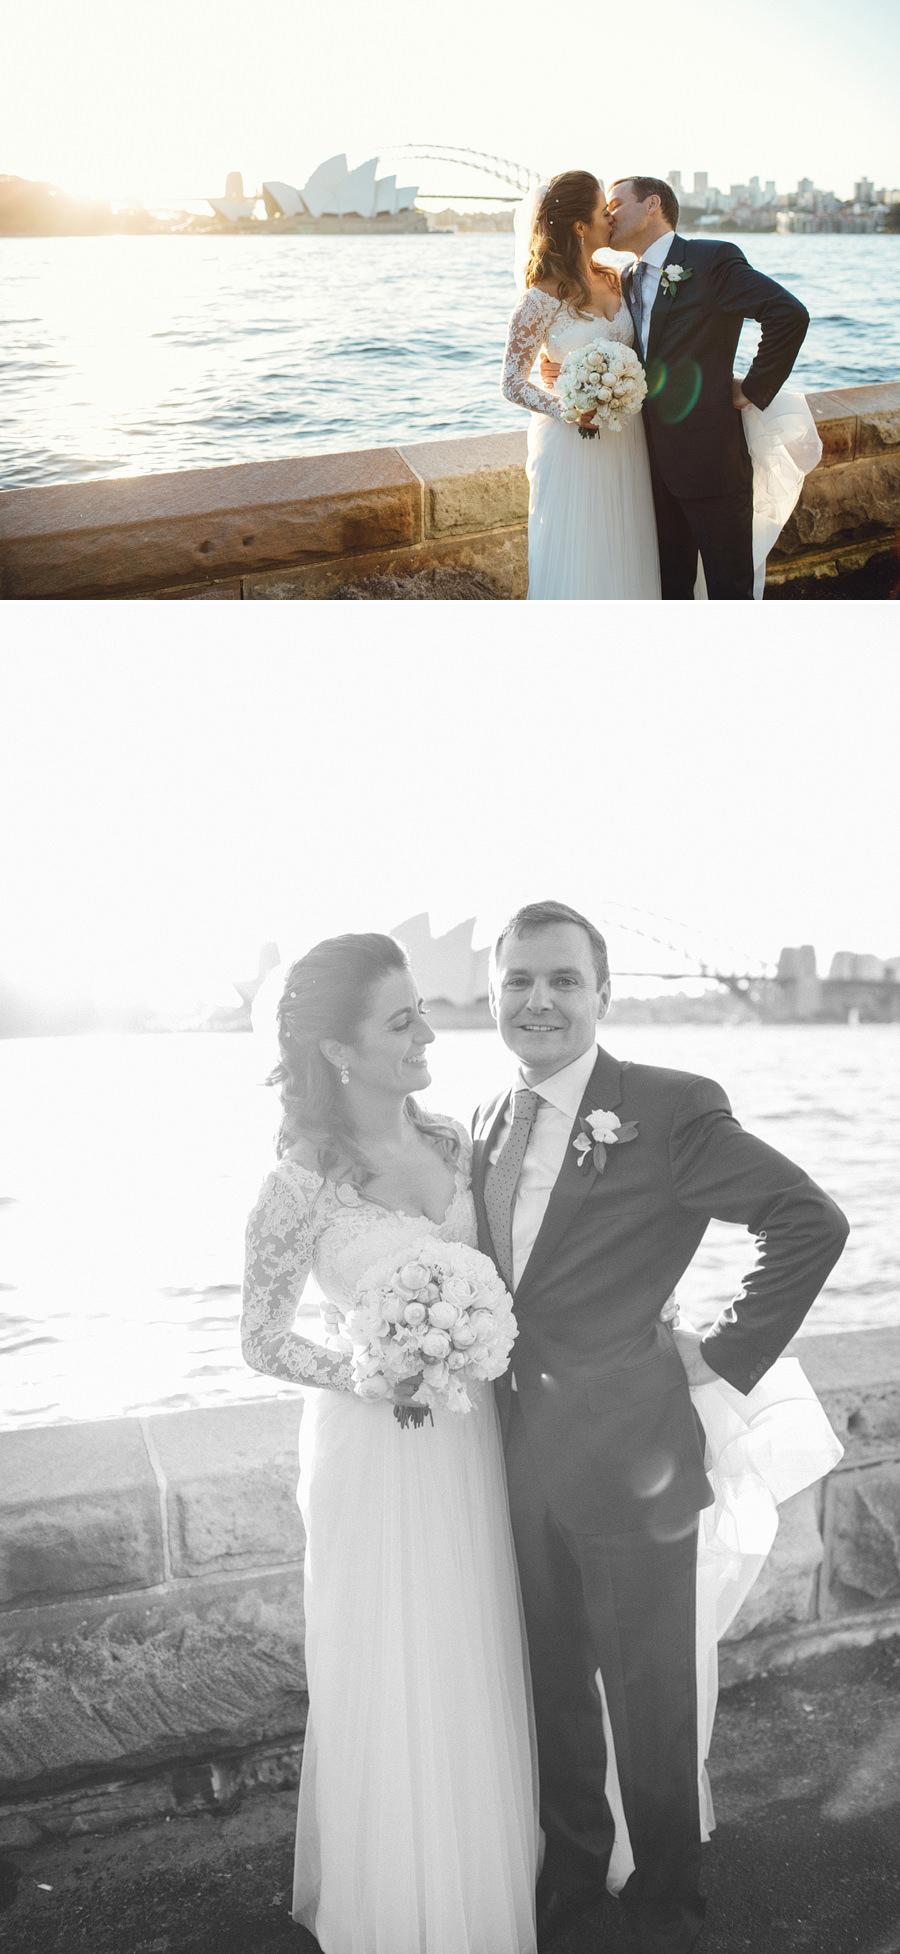 Mrs Macquarie's Chair Wedding Photographer: Portraits